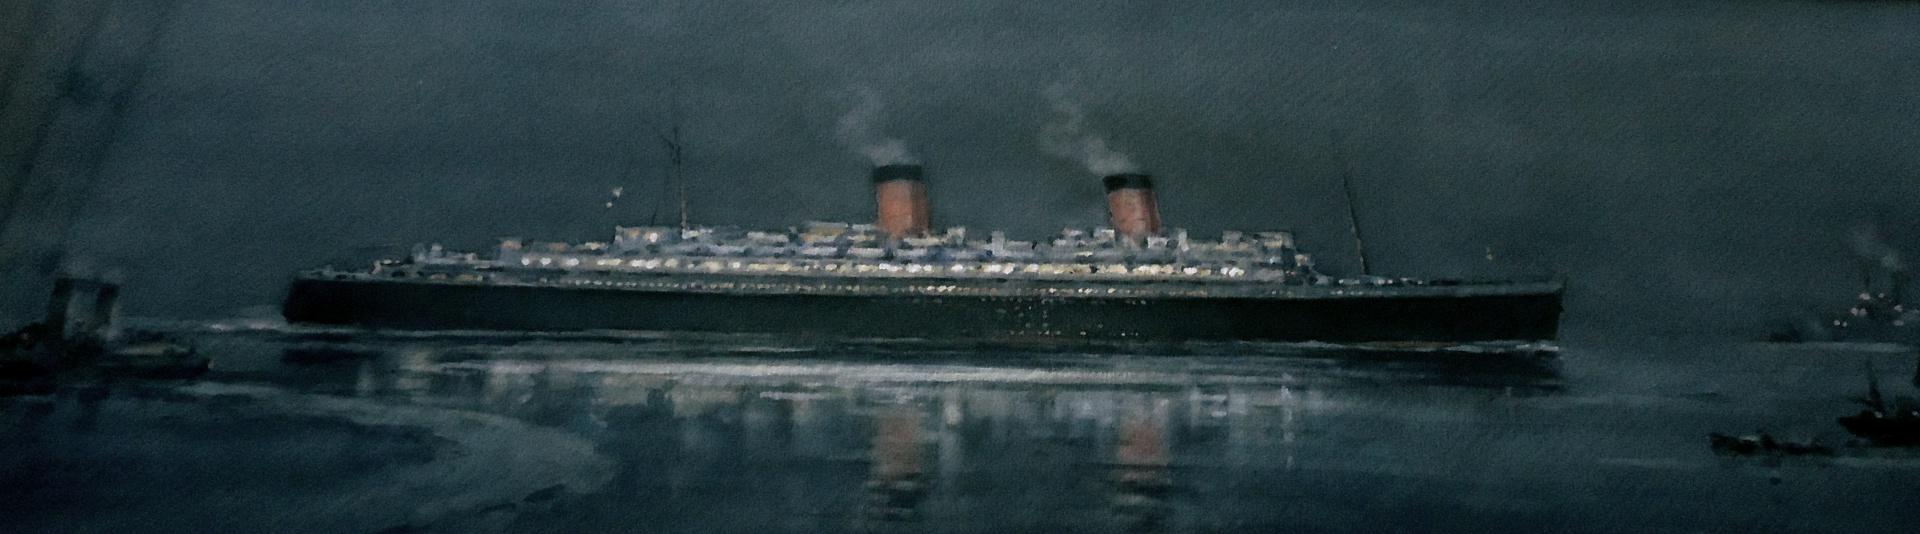 RMS QUEEN ELIZABETH Entering harbour at Night